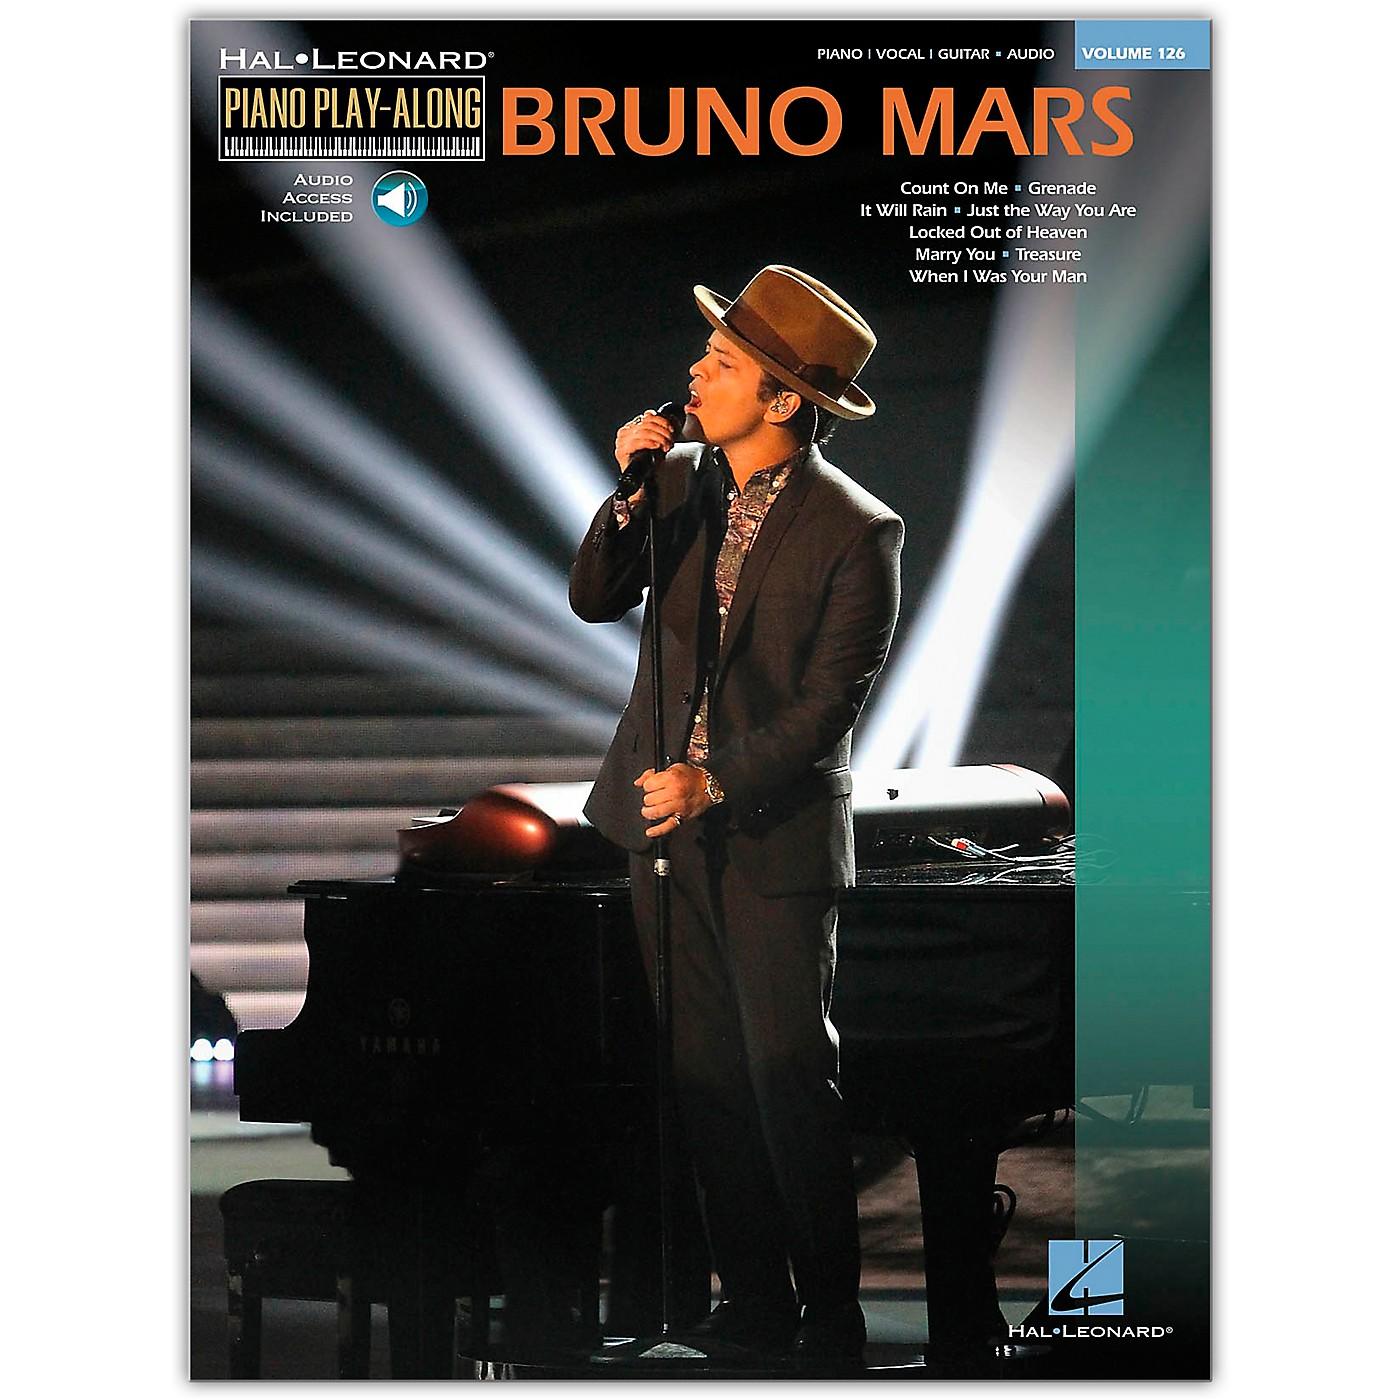 Hal Leonard Bruno Mars - Piano Play-Along Volume 126 Book/Online Audio thumbnail